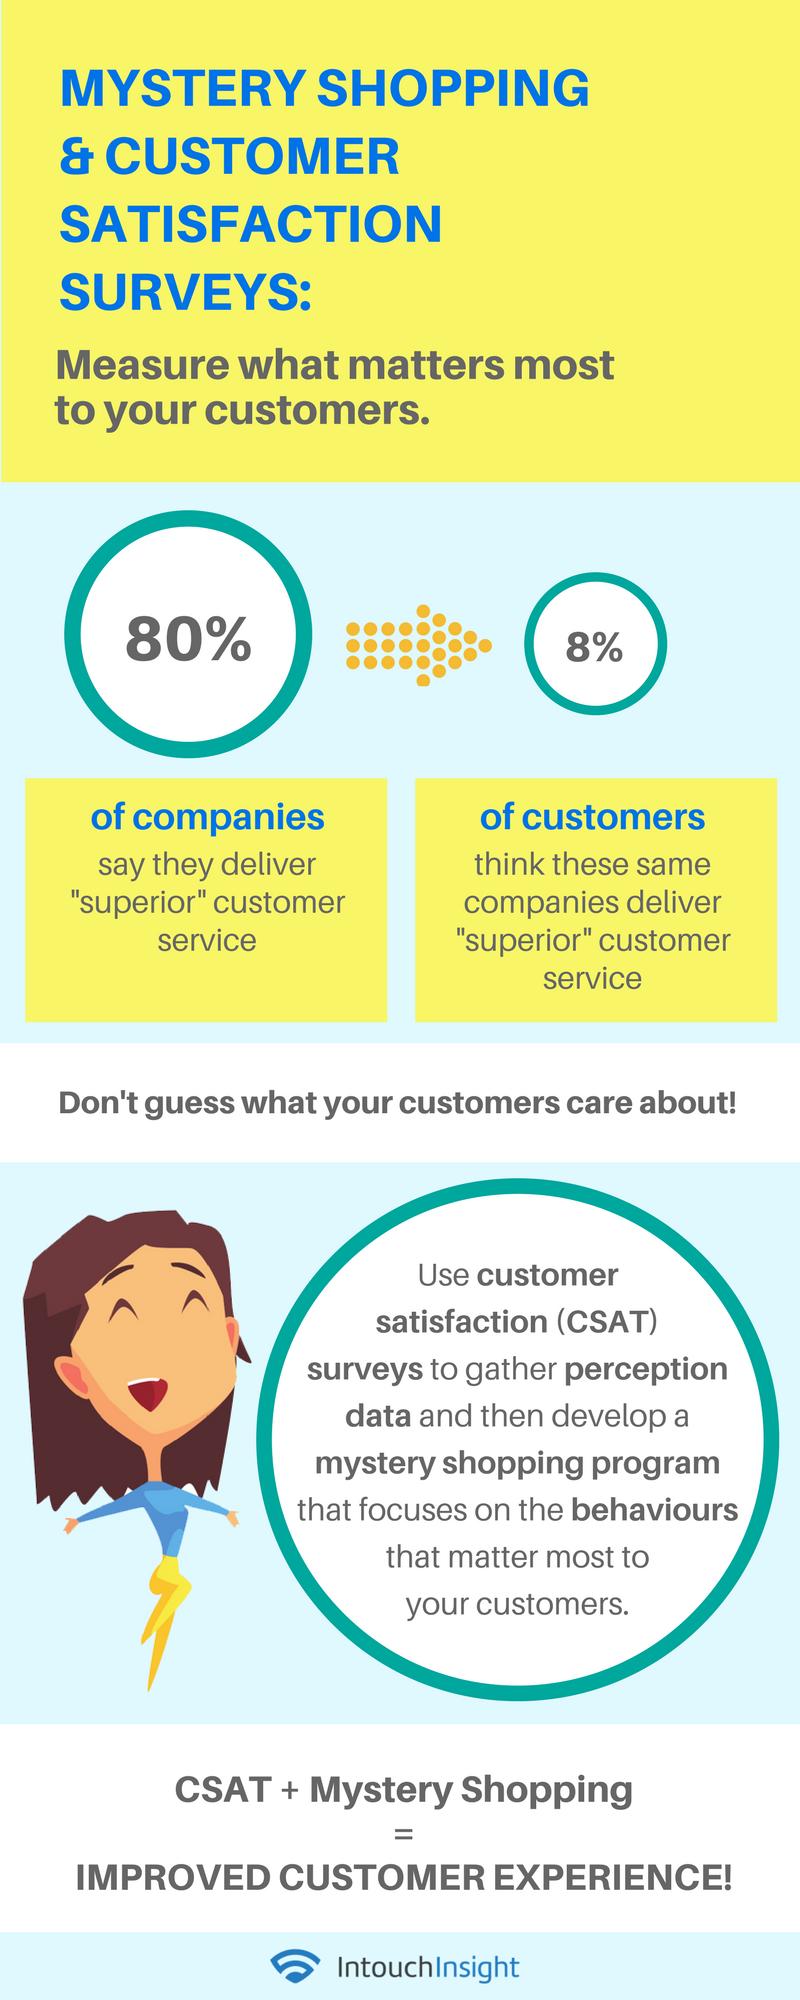 How to Improve Customer Experience with Mystery Shopping & CSAT Surveys